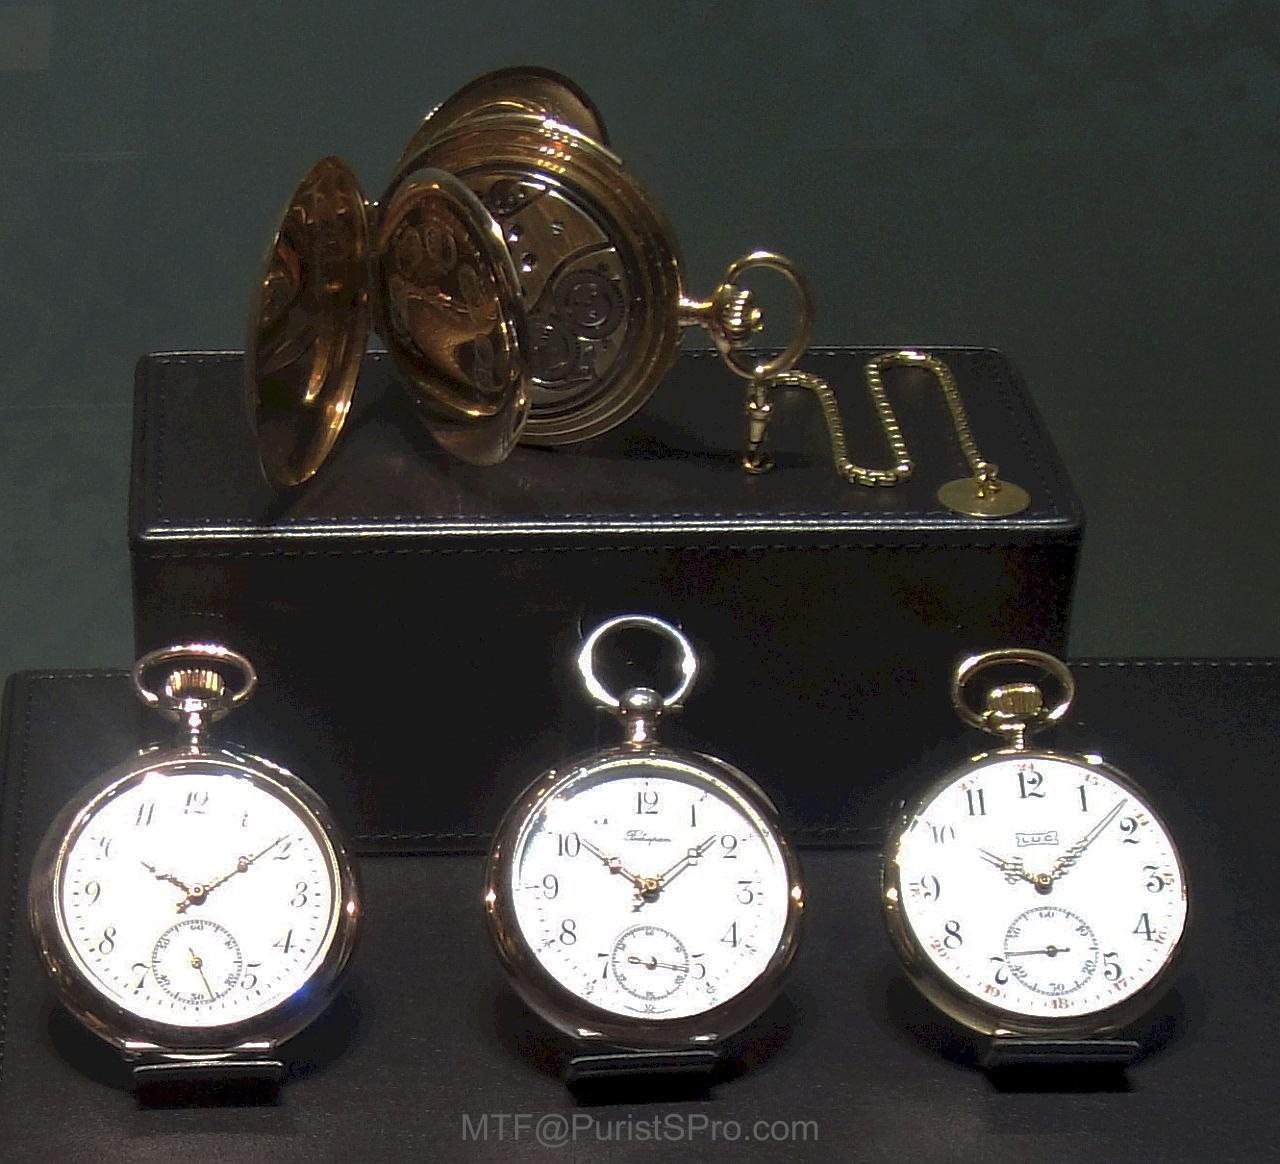 Chopard pocket watches